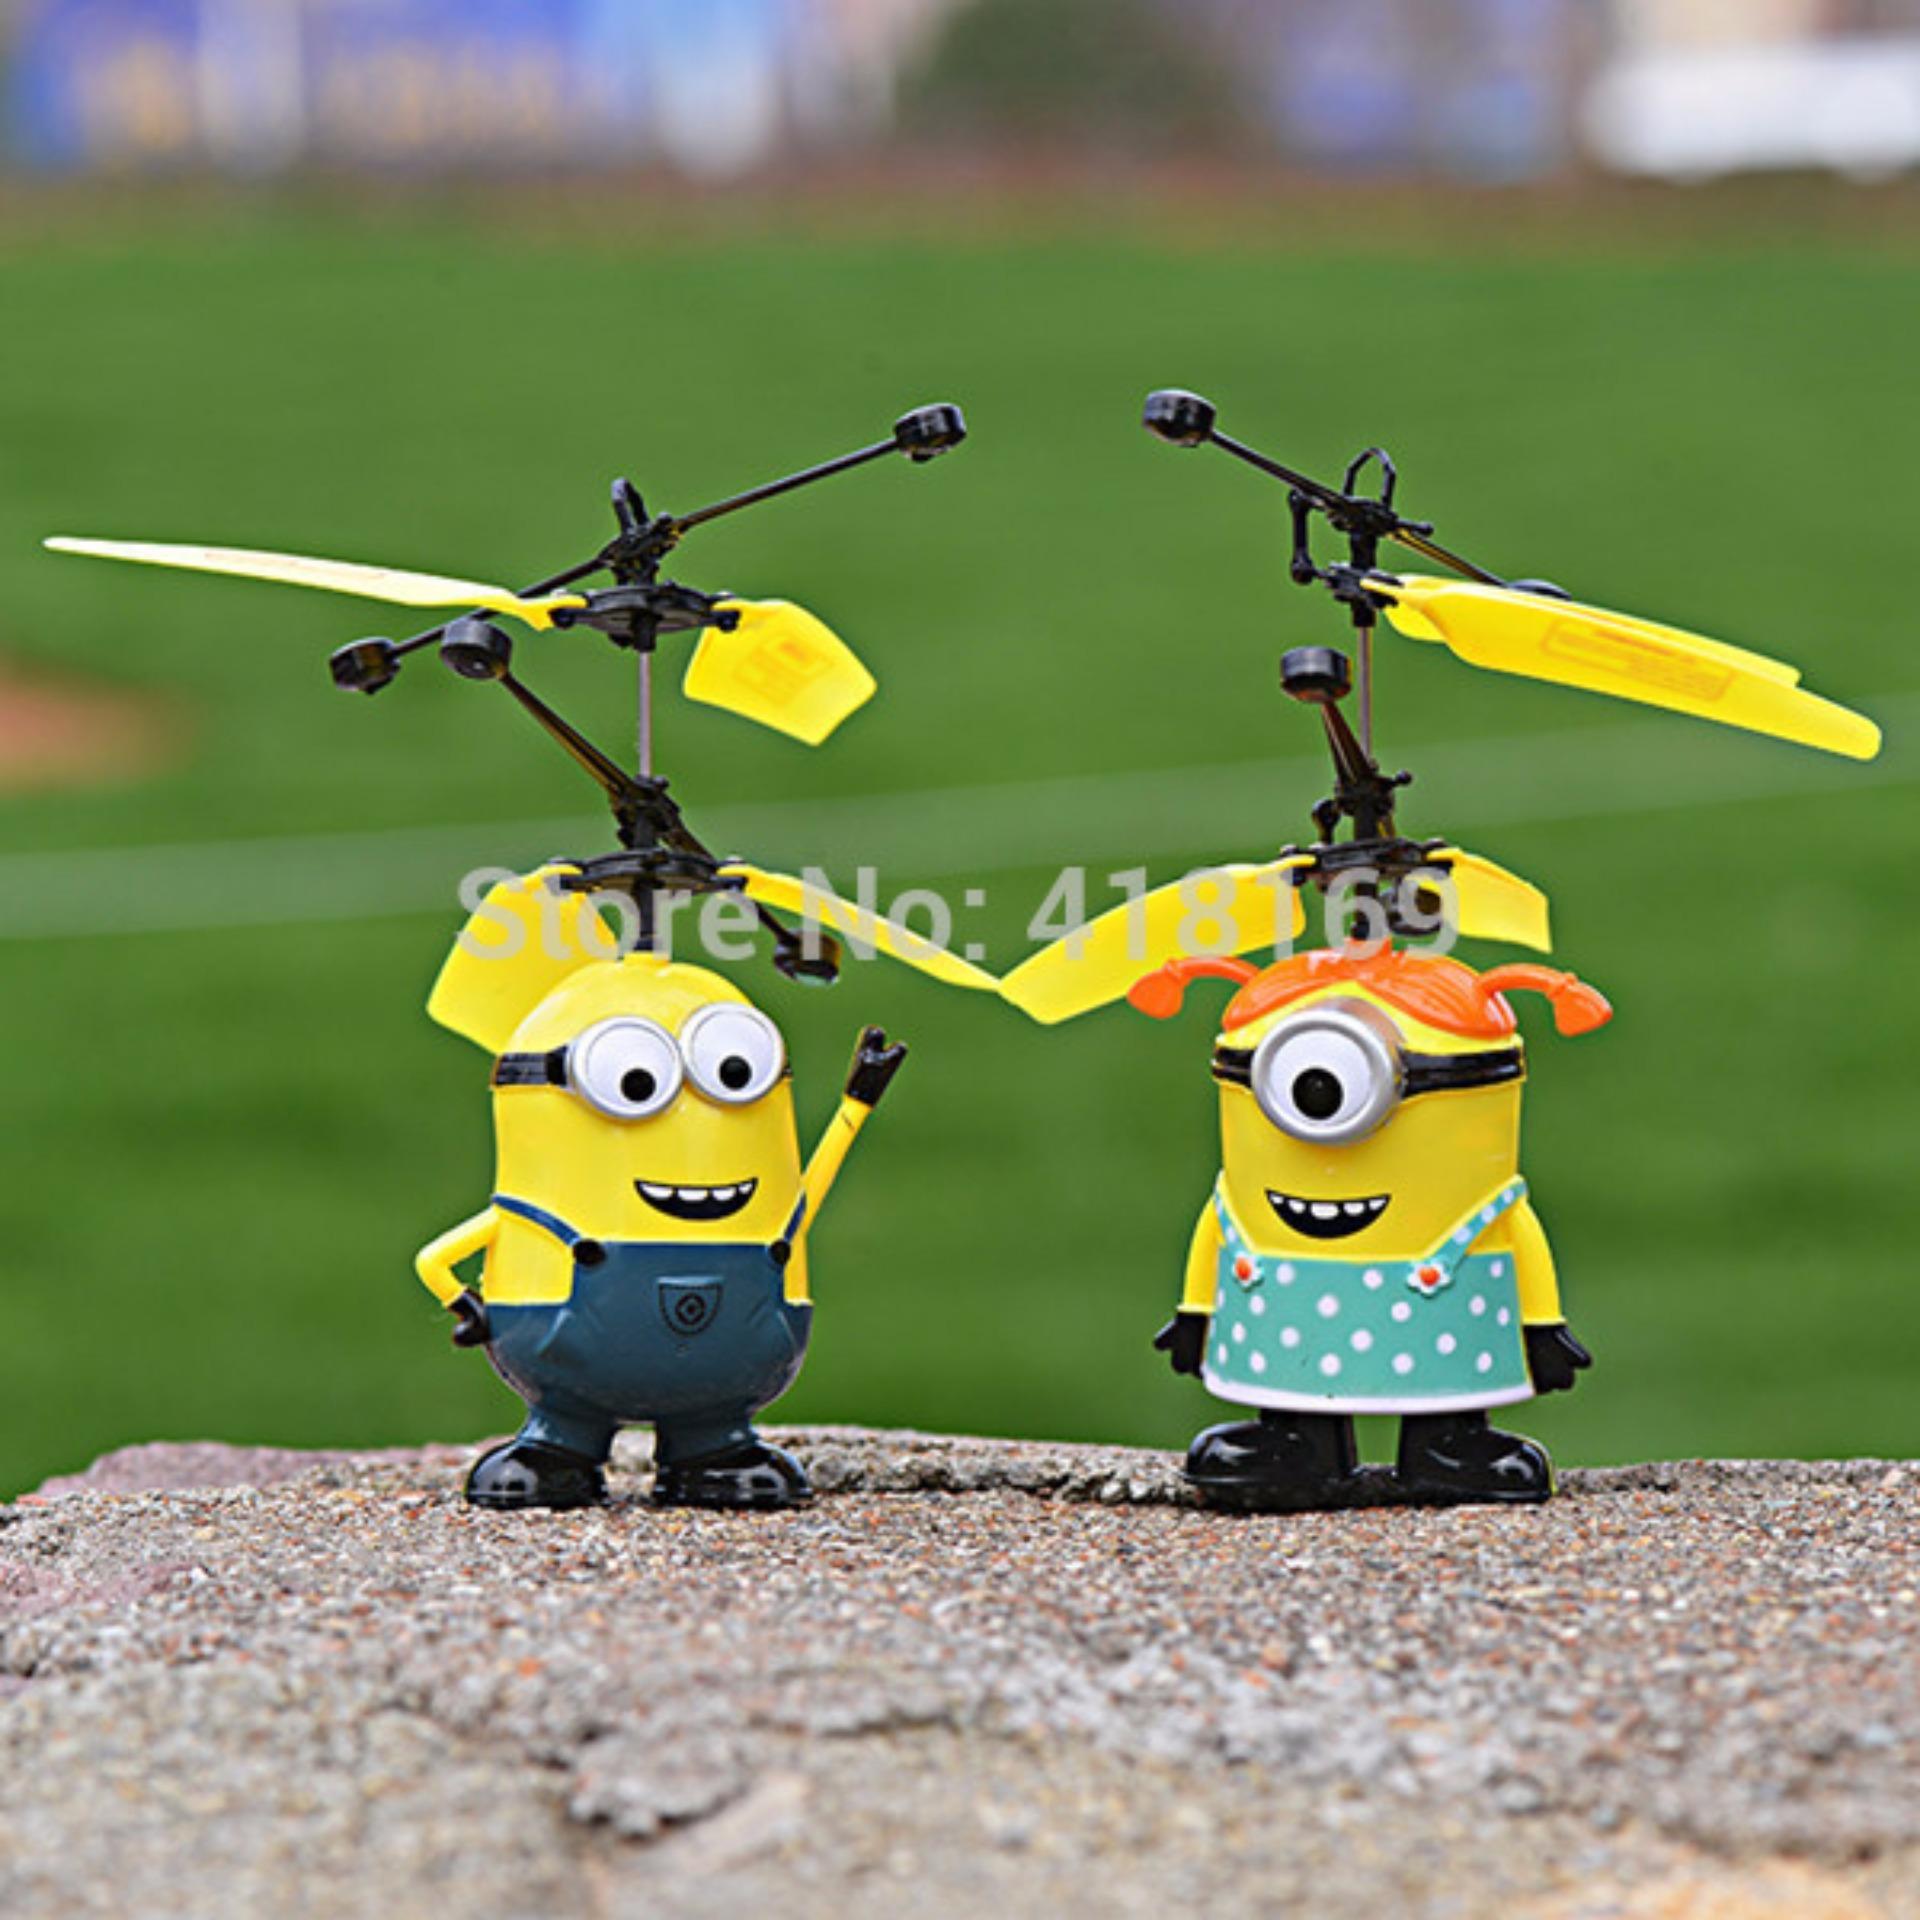 Price Checker Minion Toys Drone Flash Sensor Tanpa Remote Cari Karakter Helikopter Mainan Terbang